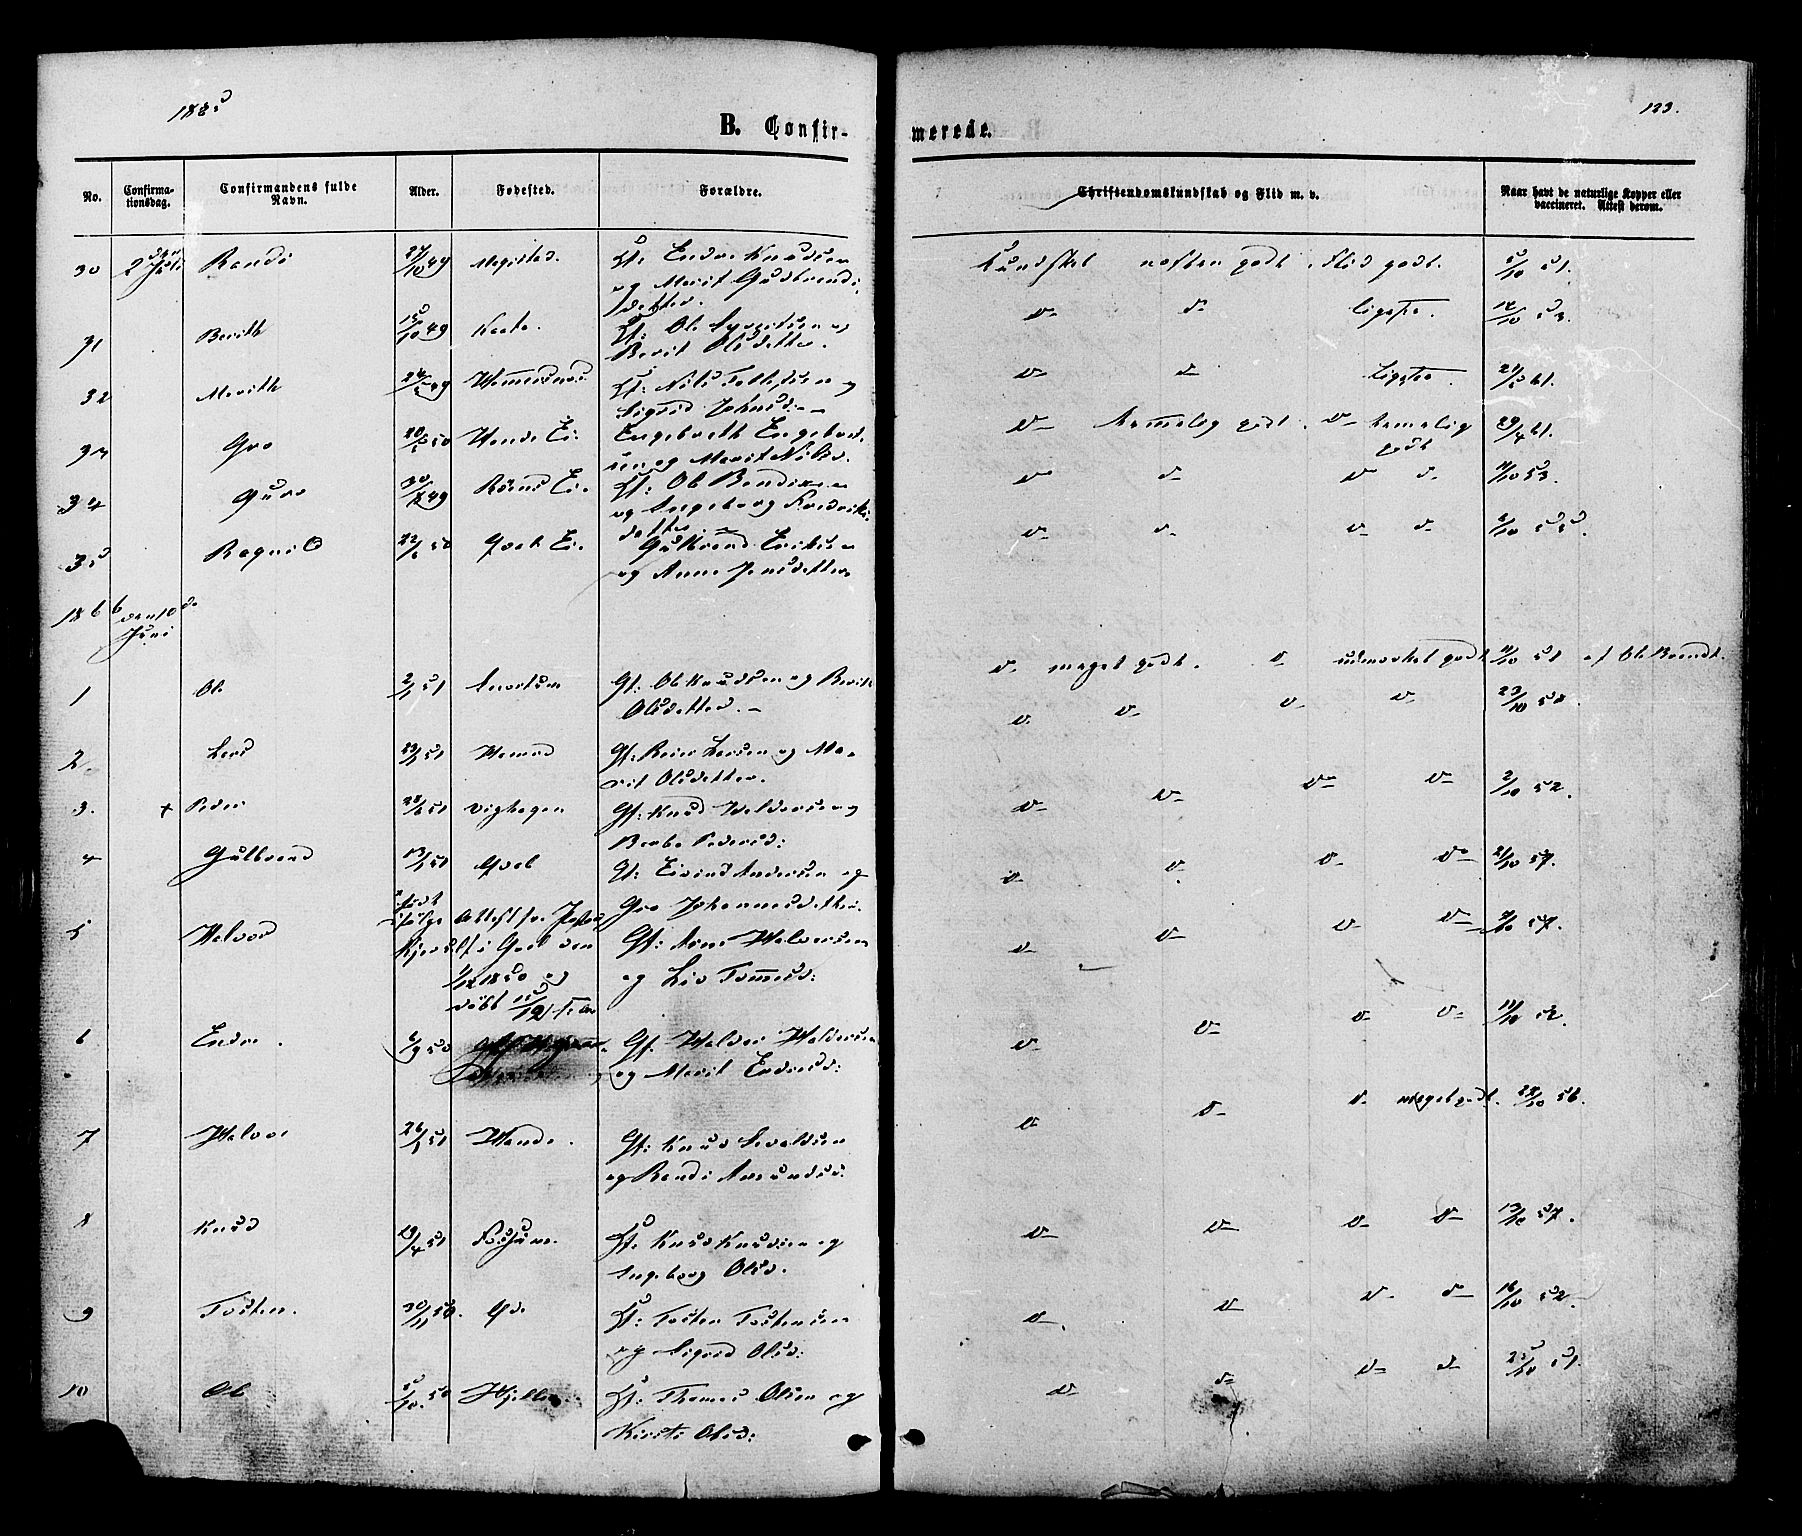 SAH, Vestre Slidre prestekontor, Ministerialbok nr. 3, 1865-1880, s. 123